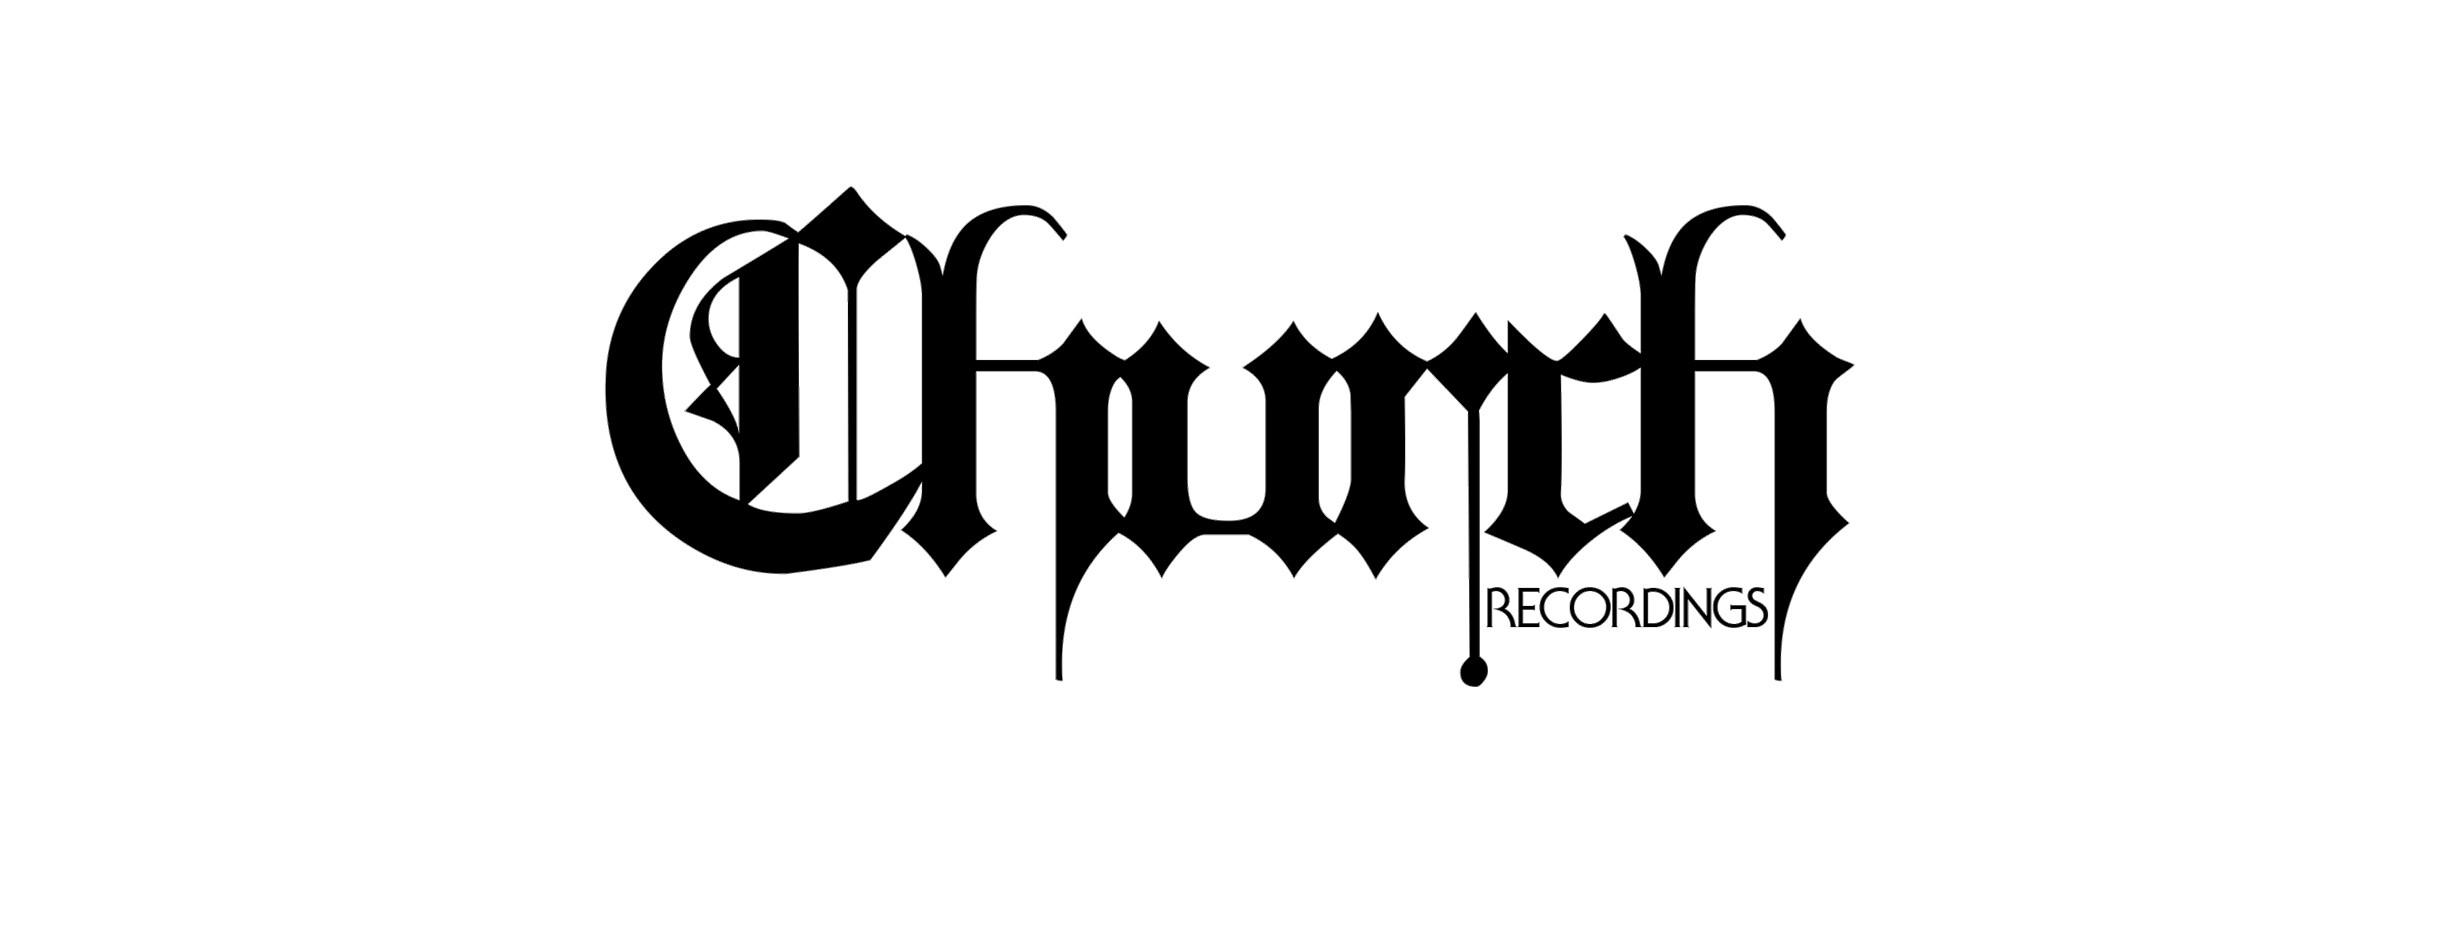 Church Recordings